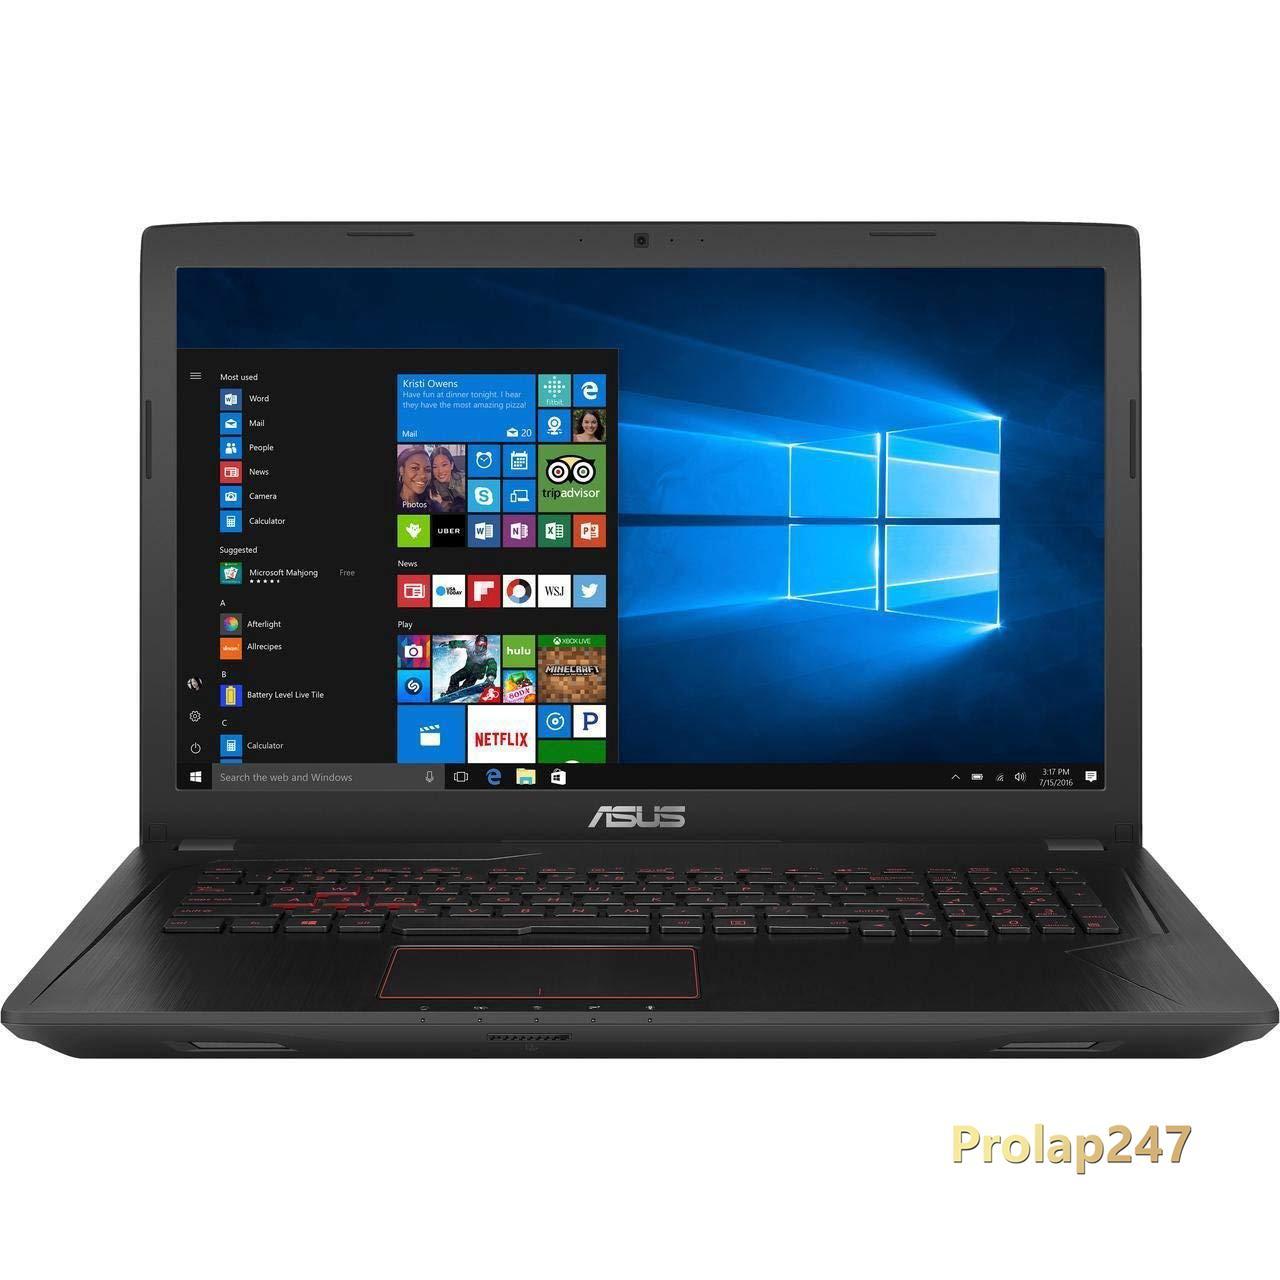 Mua Online Laptop Gii Tr Asus Cht Lng Gi Tt Ti Lazada Tuf Fx504gm I5 8300h 8gb 128gb 1tb Sshd Gtx1060 6gb W10 Gaming Fx53vd I7 7700hq Ssd 156 Fhd Gtx 1050